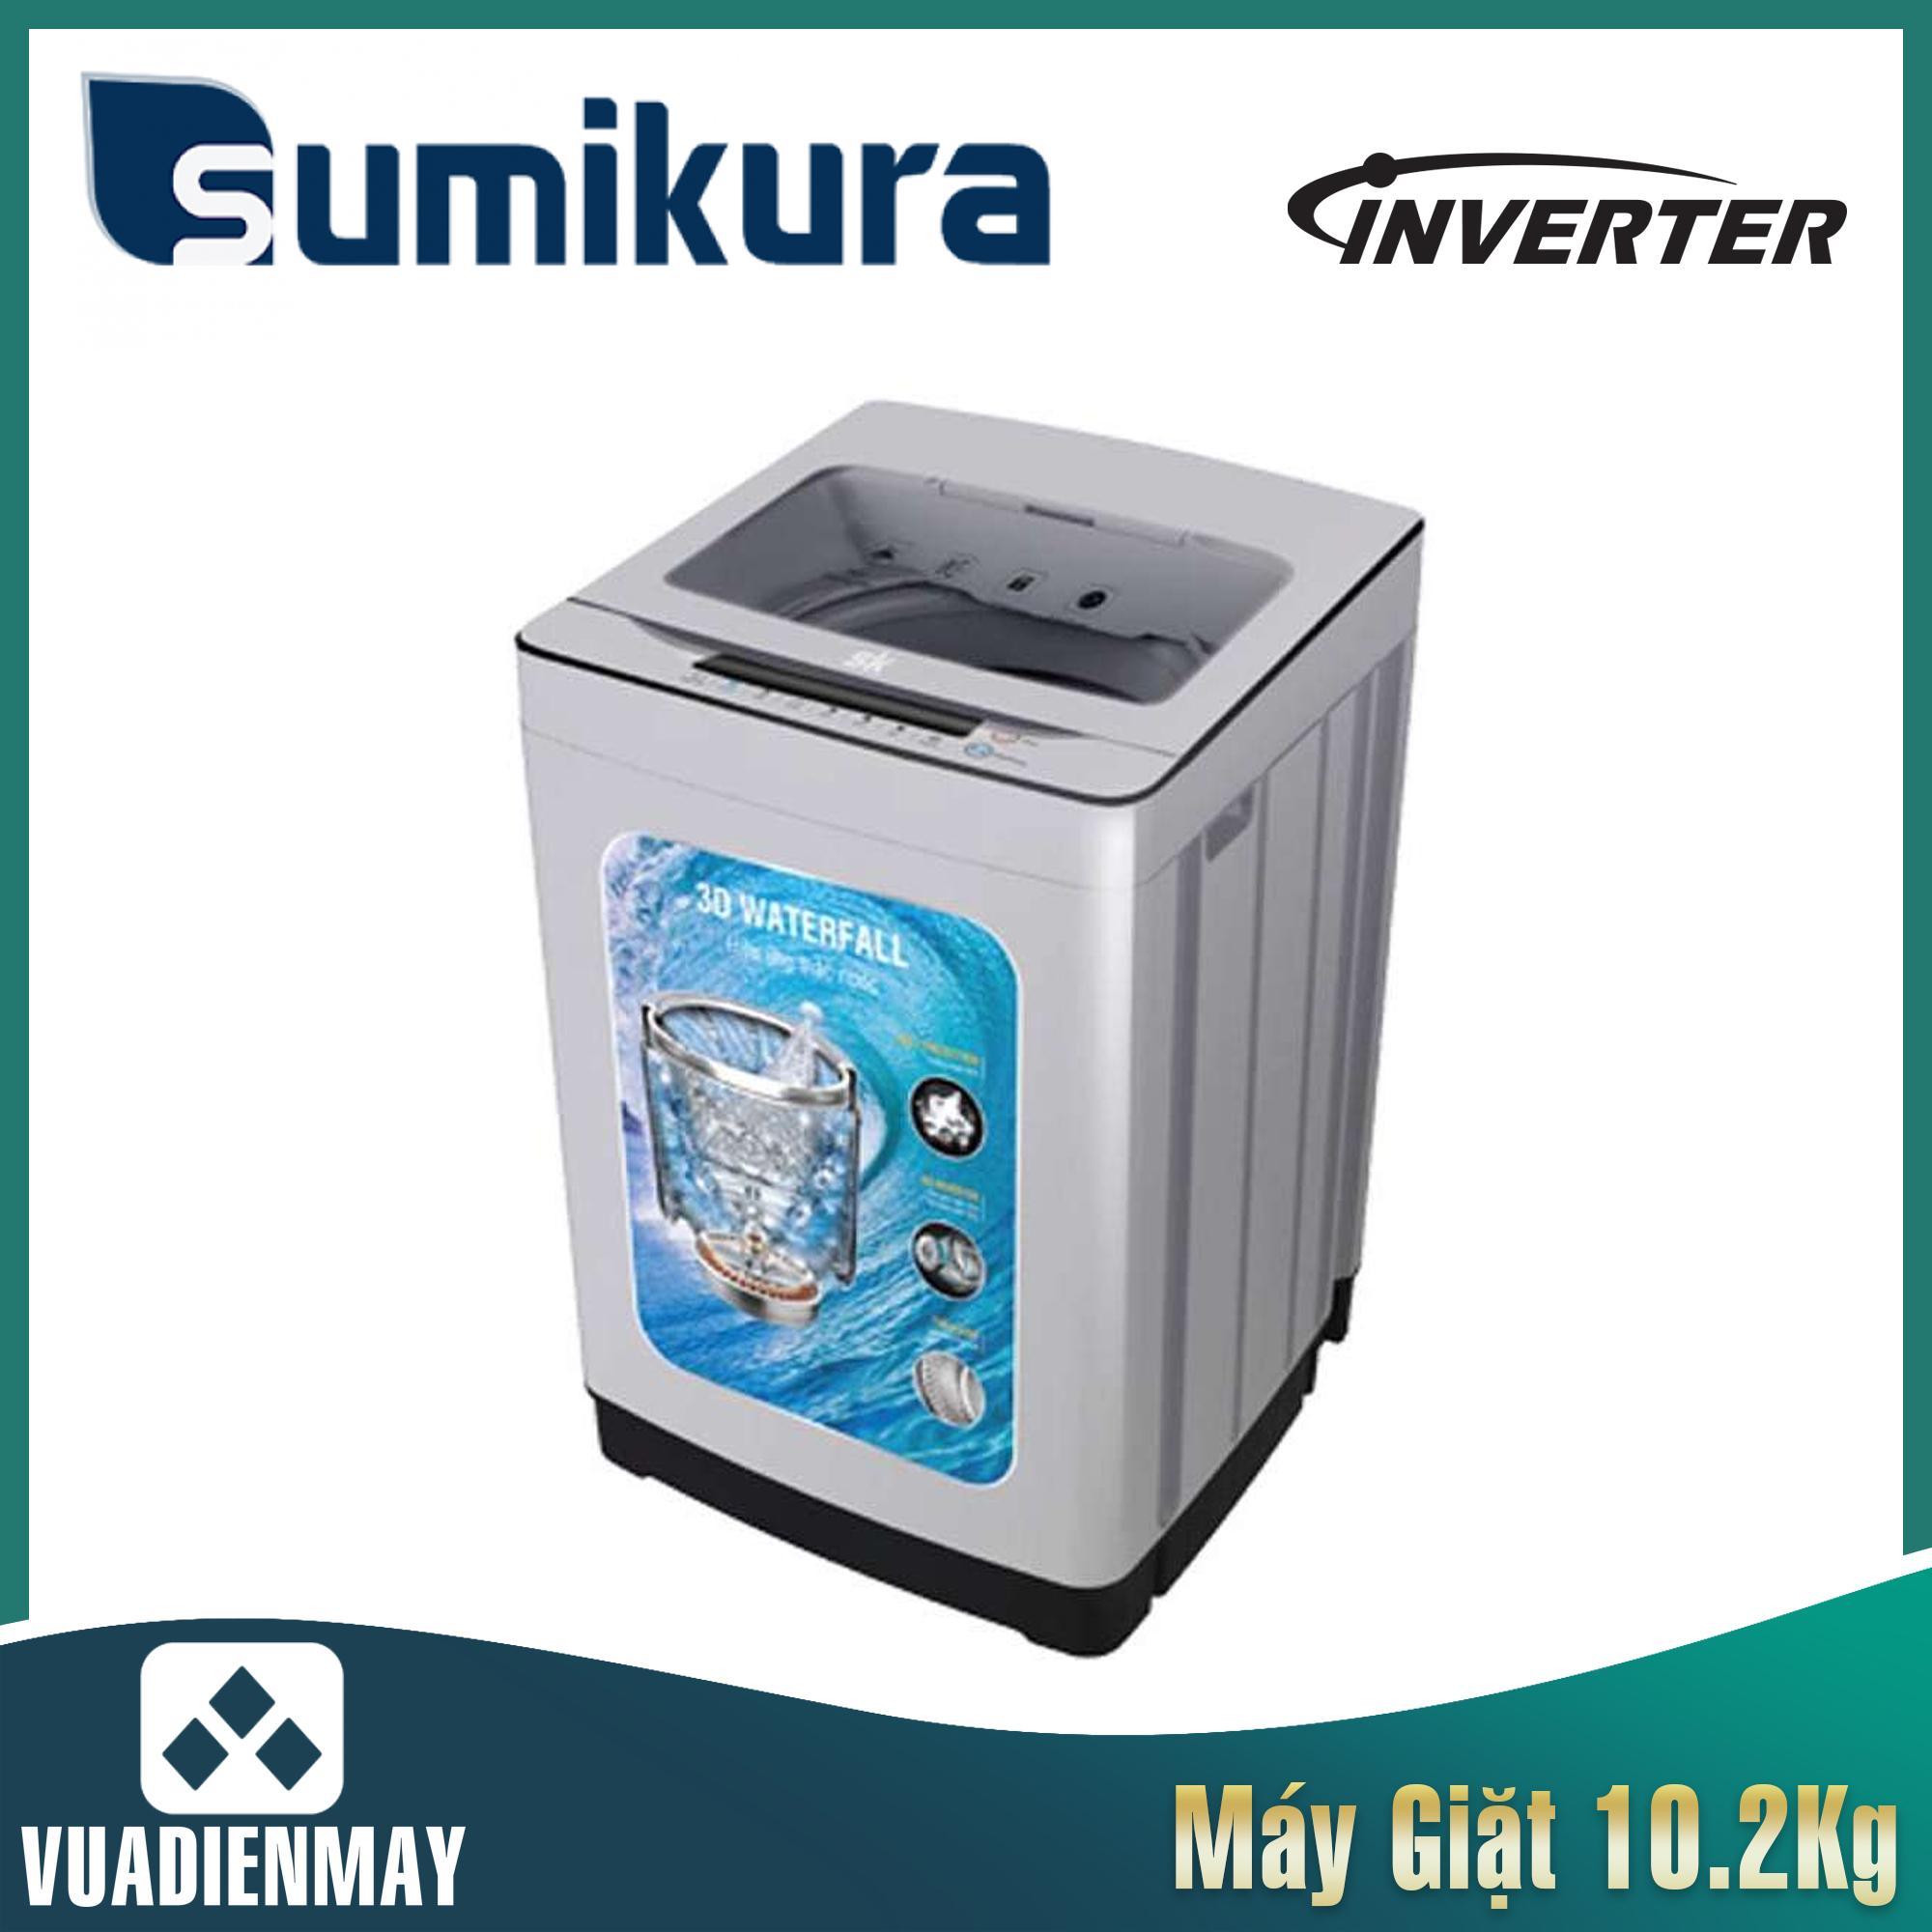 Máy giặt Sumikura  10.2kg lồng đứng Inverter